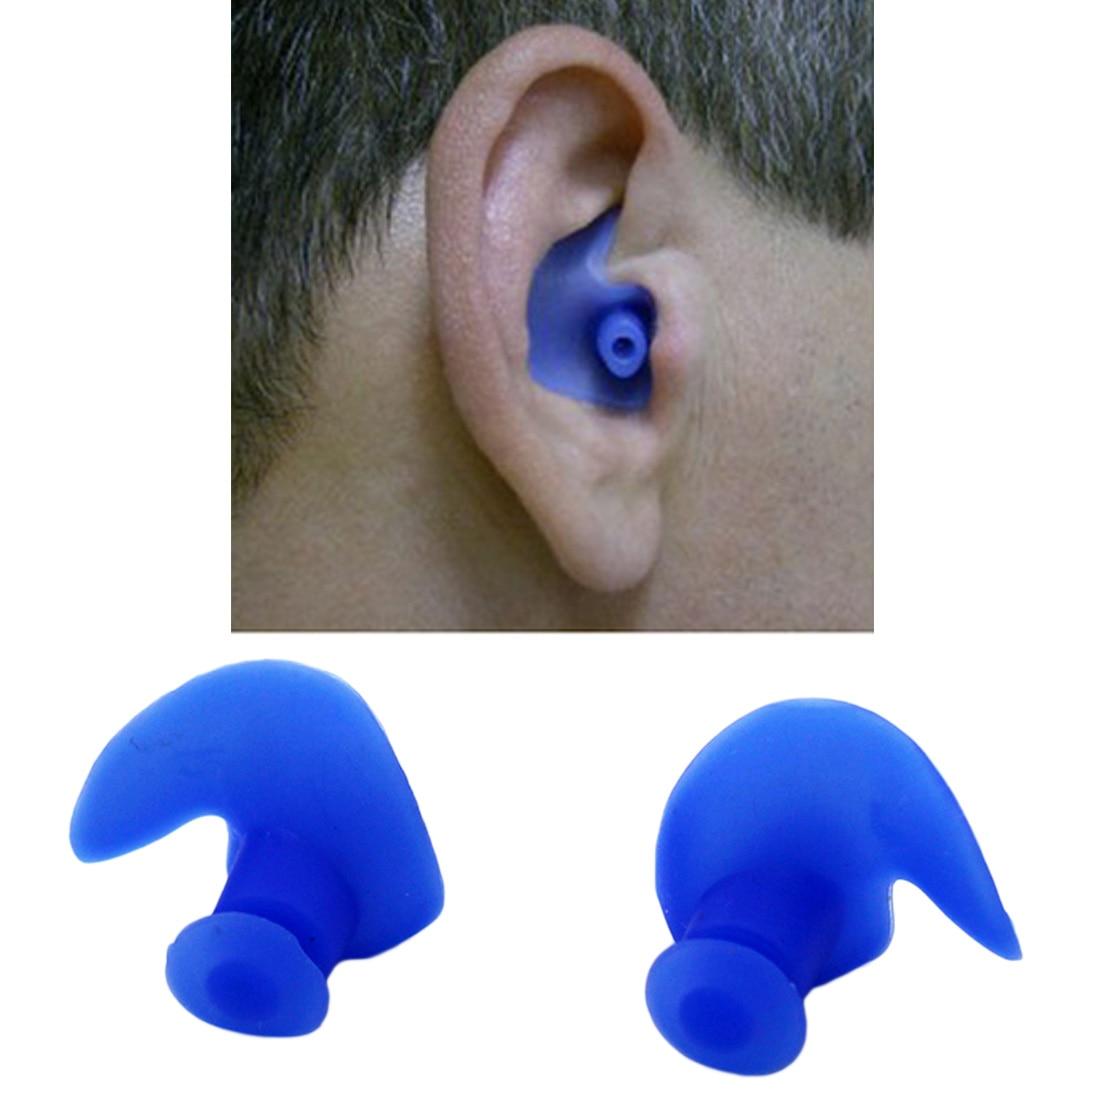 Waterproof Swimming Earplugs Professional Silicone Swim Earplugs Adult Swimmers Children Diving Soft Anti-Noise Ear Plug nuotata